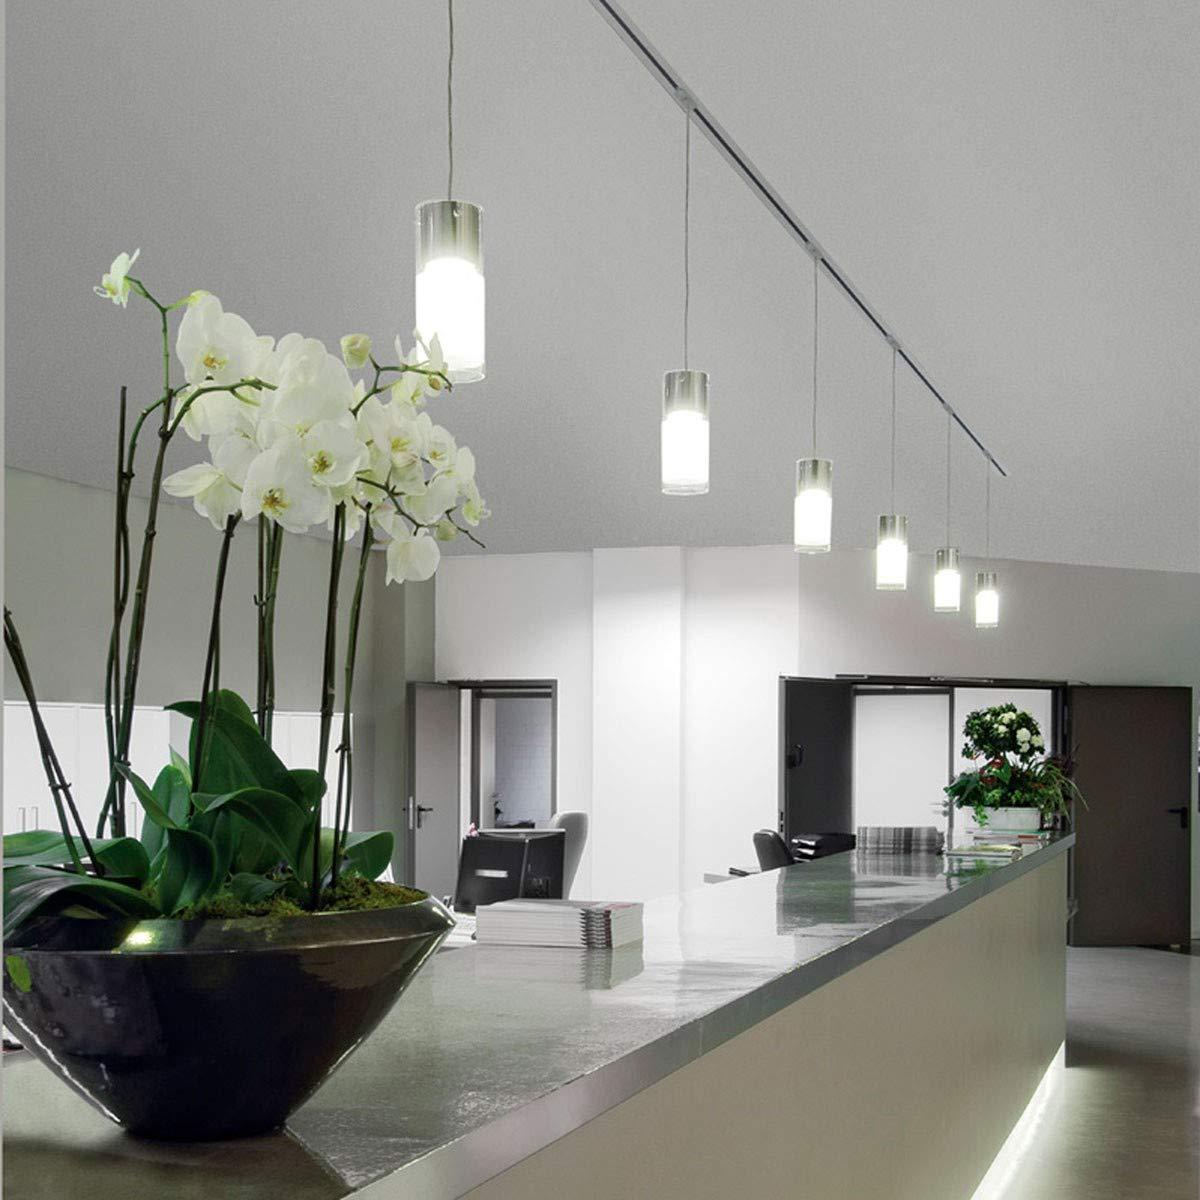 Silbergrau SLV COMMO Leuchte Indoor-Lampe Stahl Glas Silber Lampe innen, Innen-Lampe